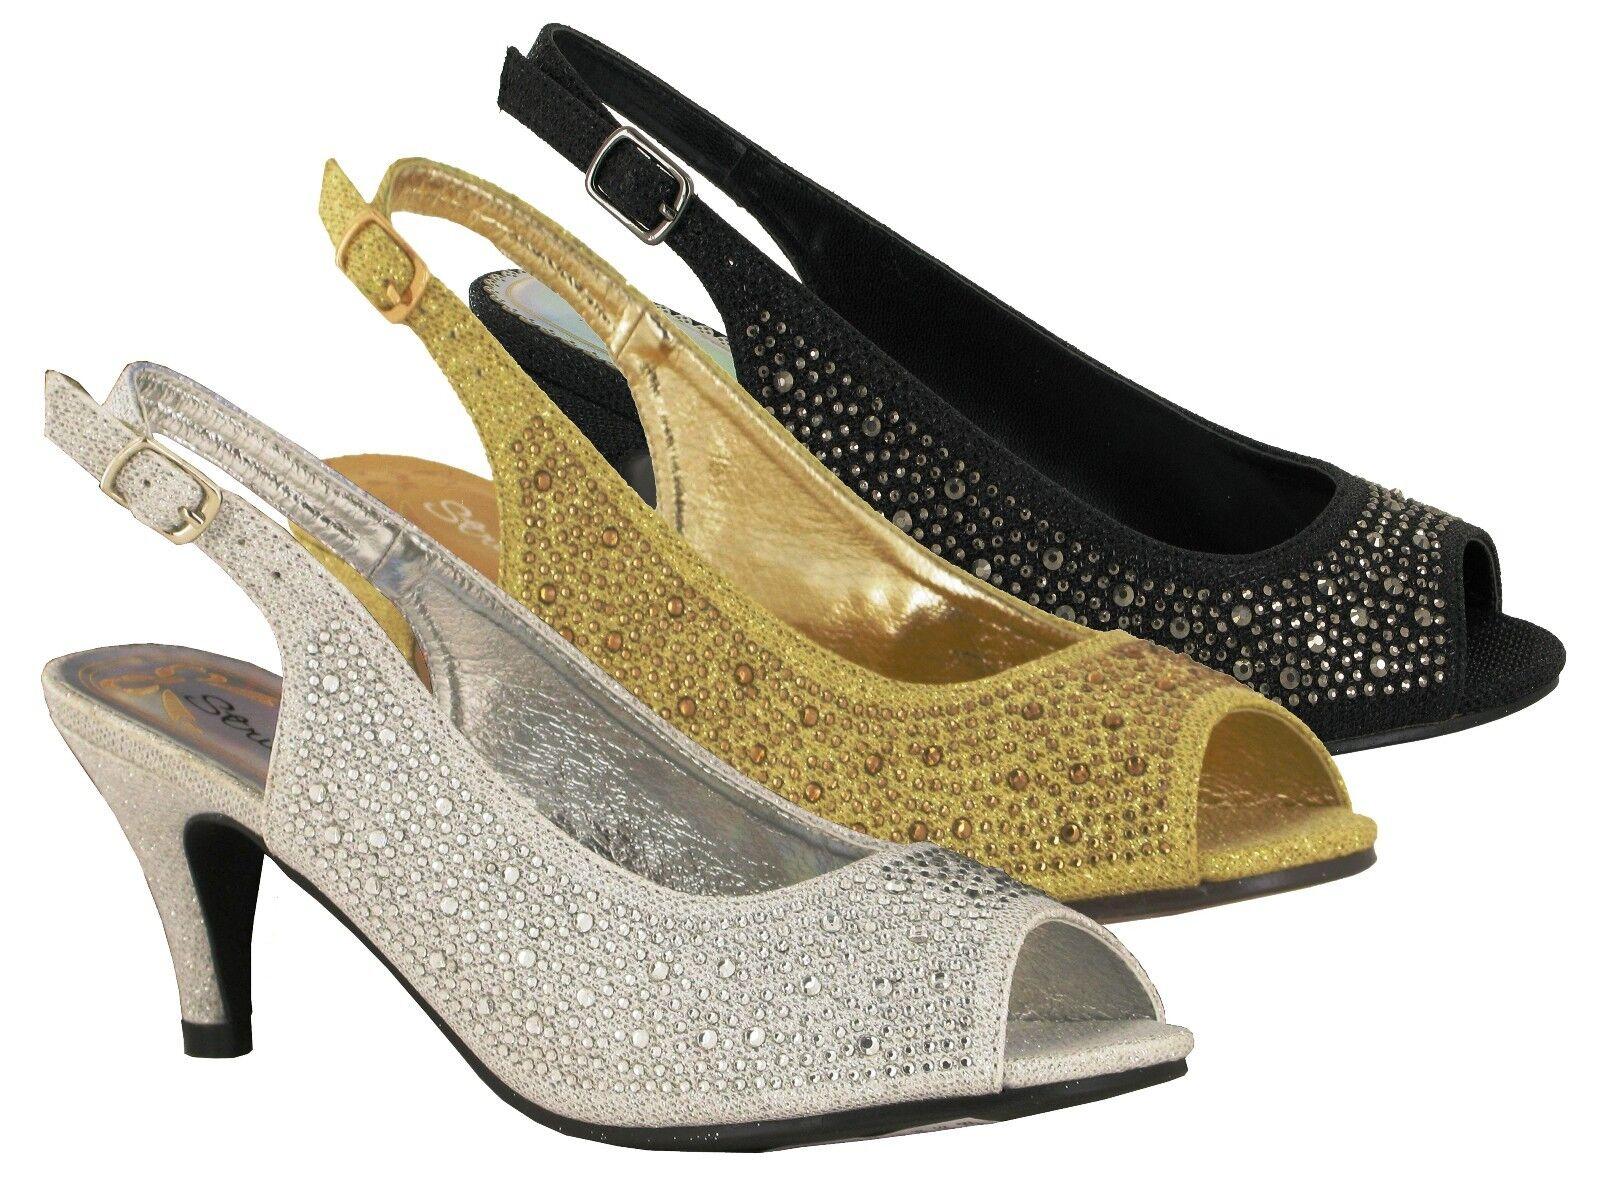 Ladies New Strictly Stone Demand Establishment Peep Toe High Demand Stone Women Sandals 1888c0